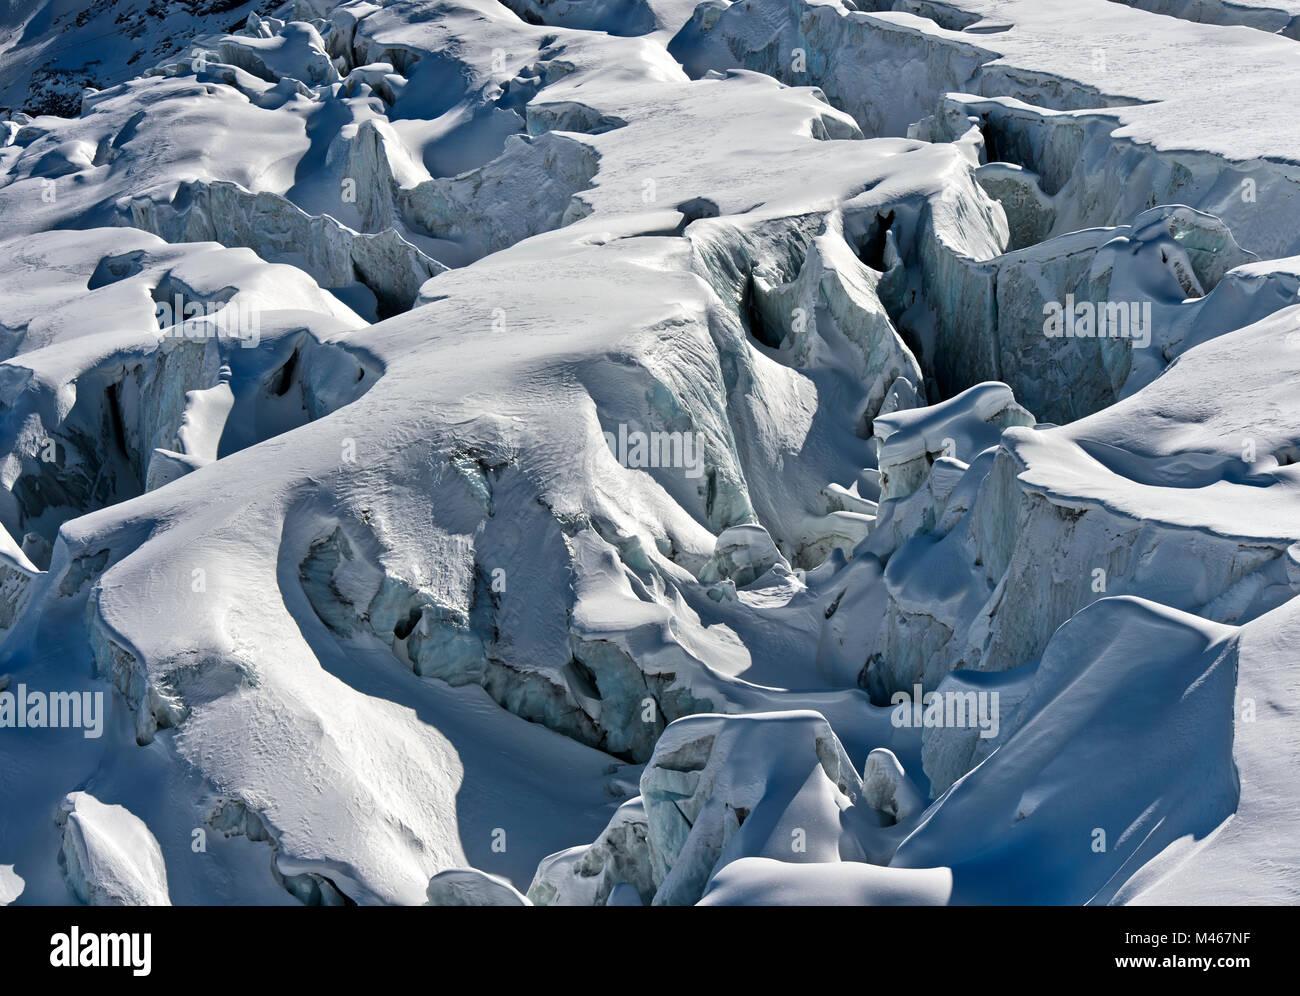 Crevasses du glacier Feegletscher, Saas-Fee, Valais, Suisse Photo Stock